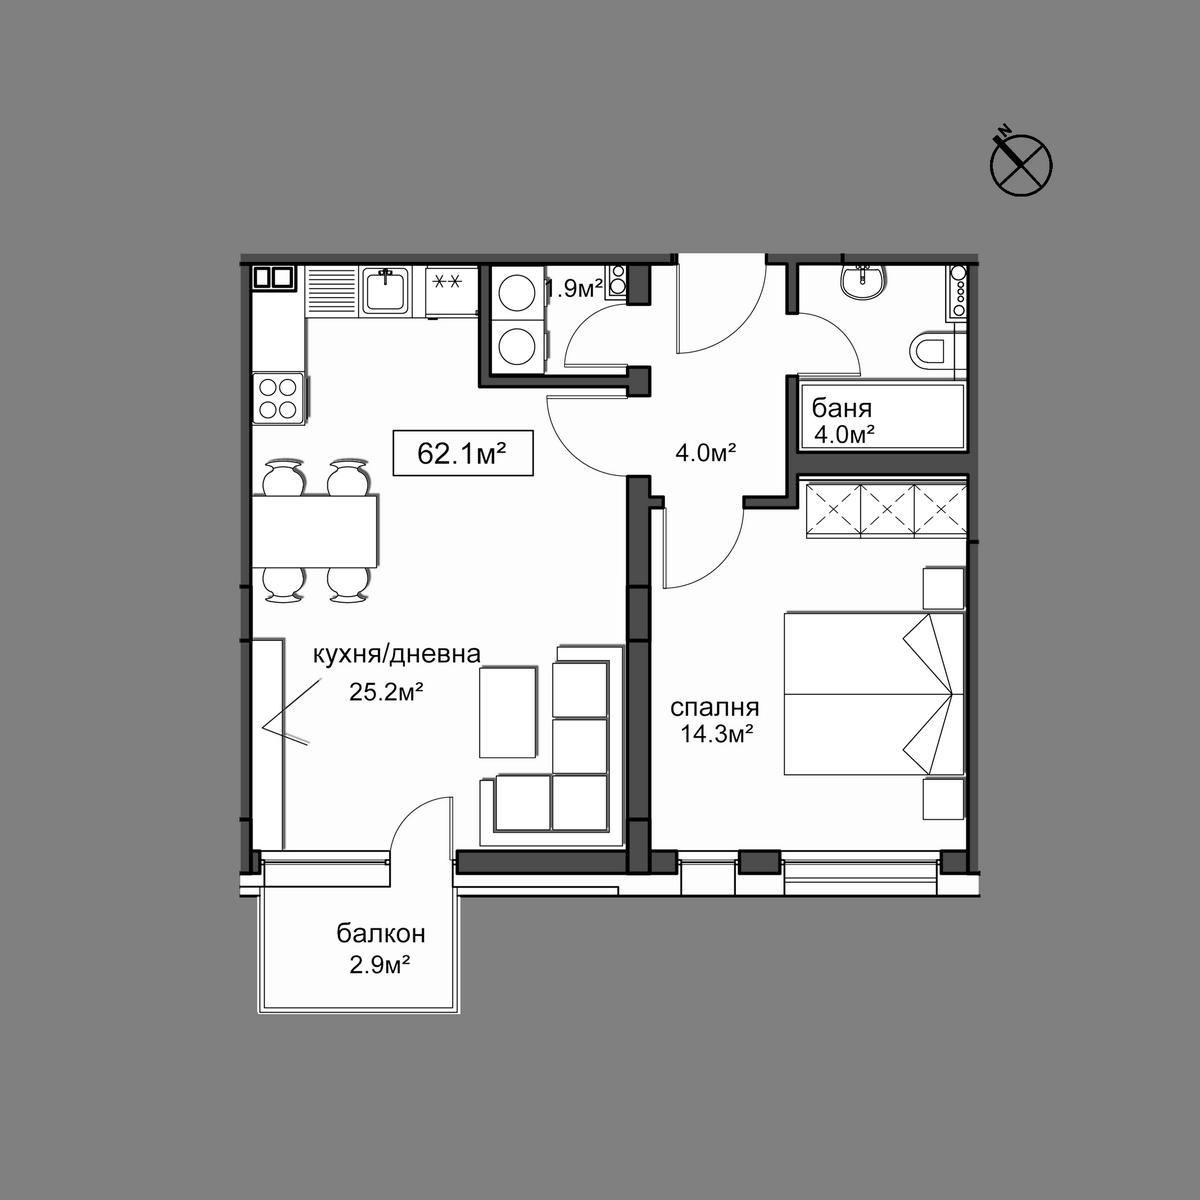 Продава апартамент ново строителство - Апартамент 11